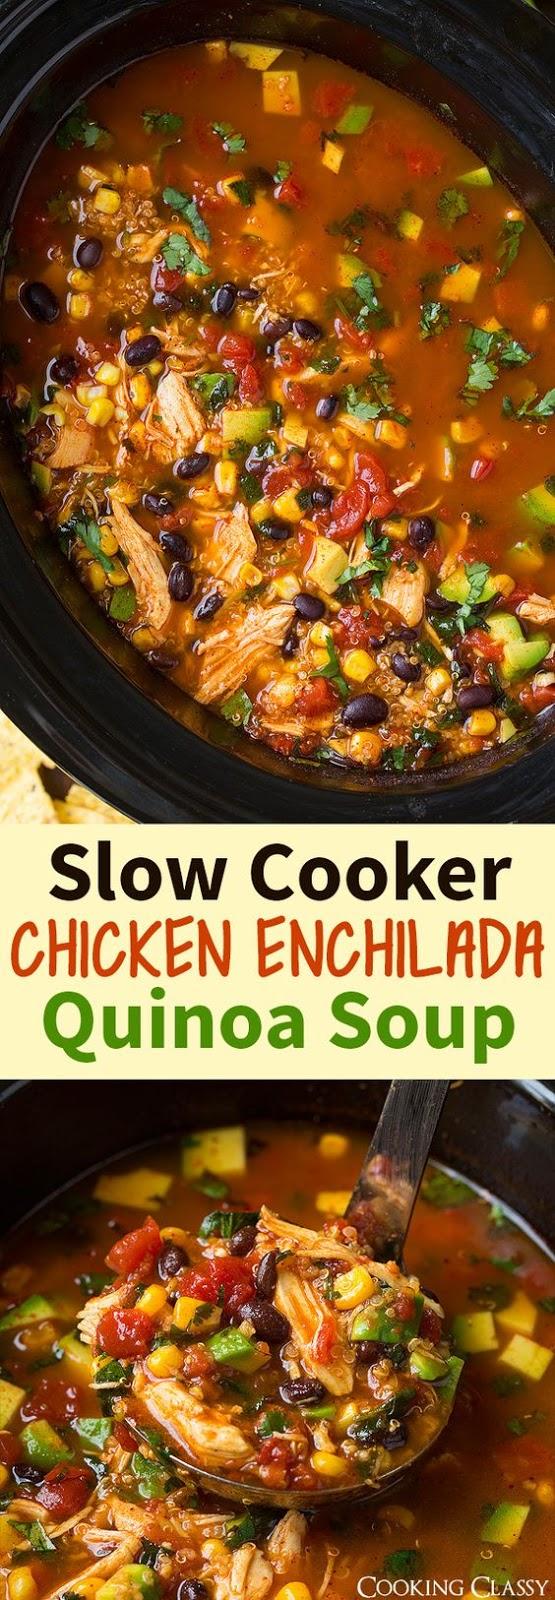 Photo of Slow Cooker Chicken Enchilada Quinoa Soup